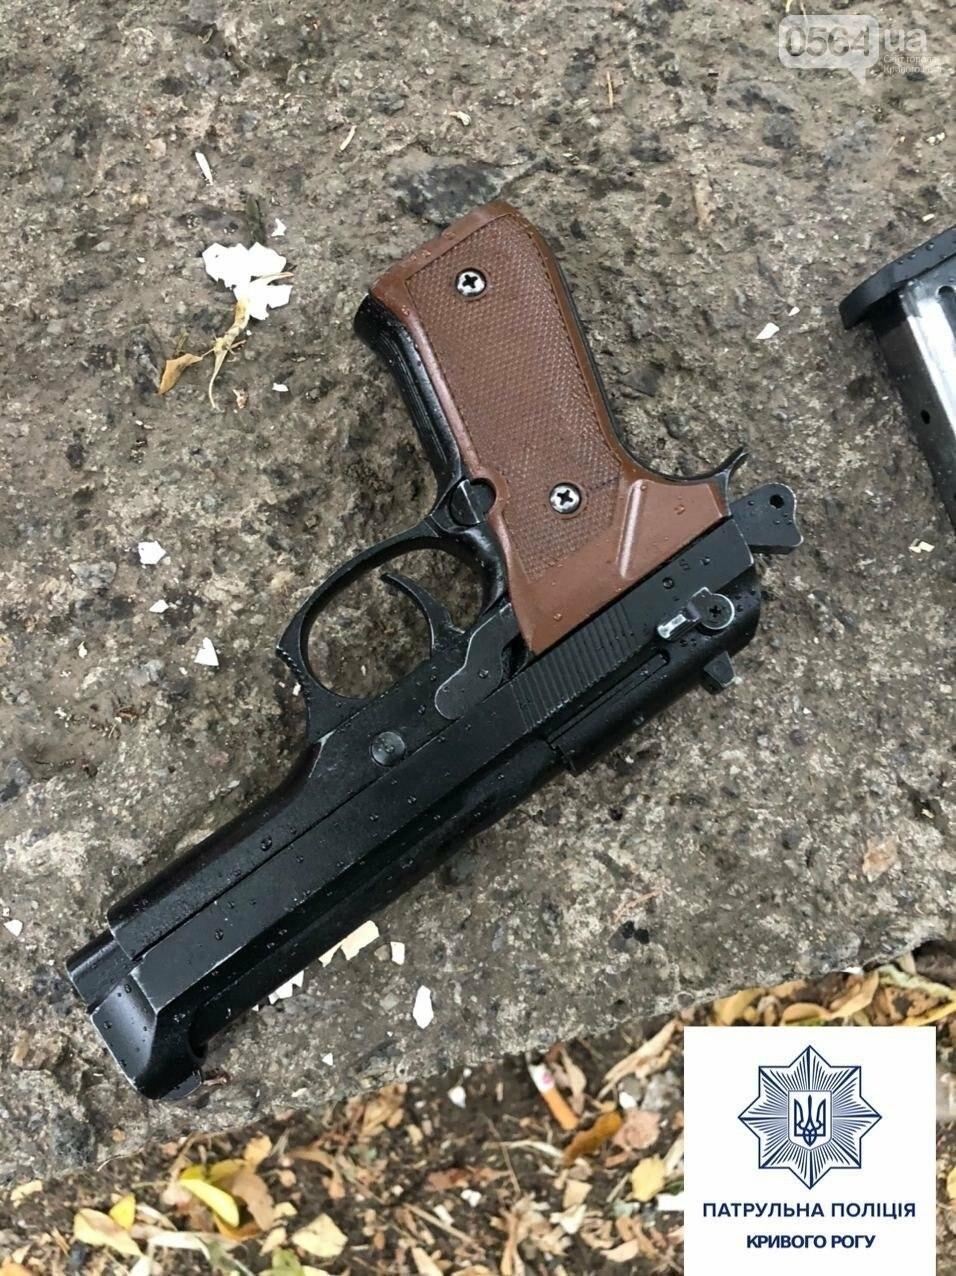 Криворожане указали копам на мужчину с пистолетом, - ФОТО , фото-1